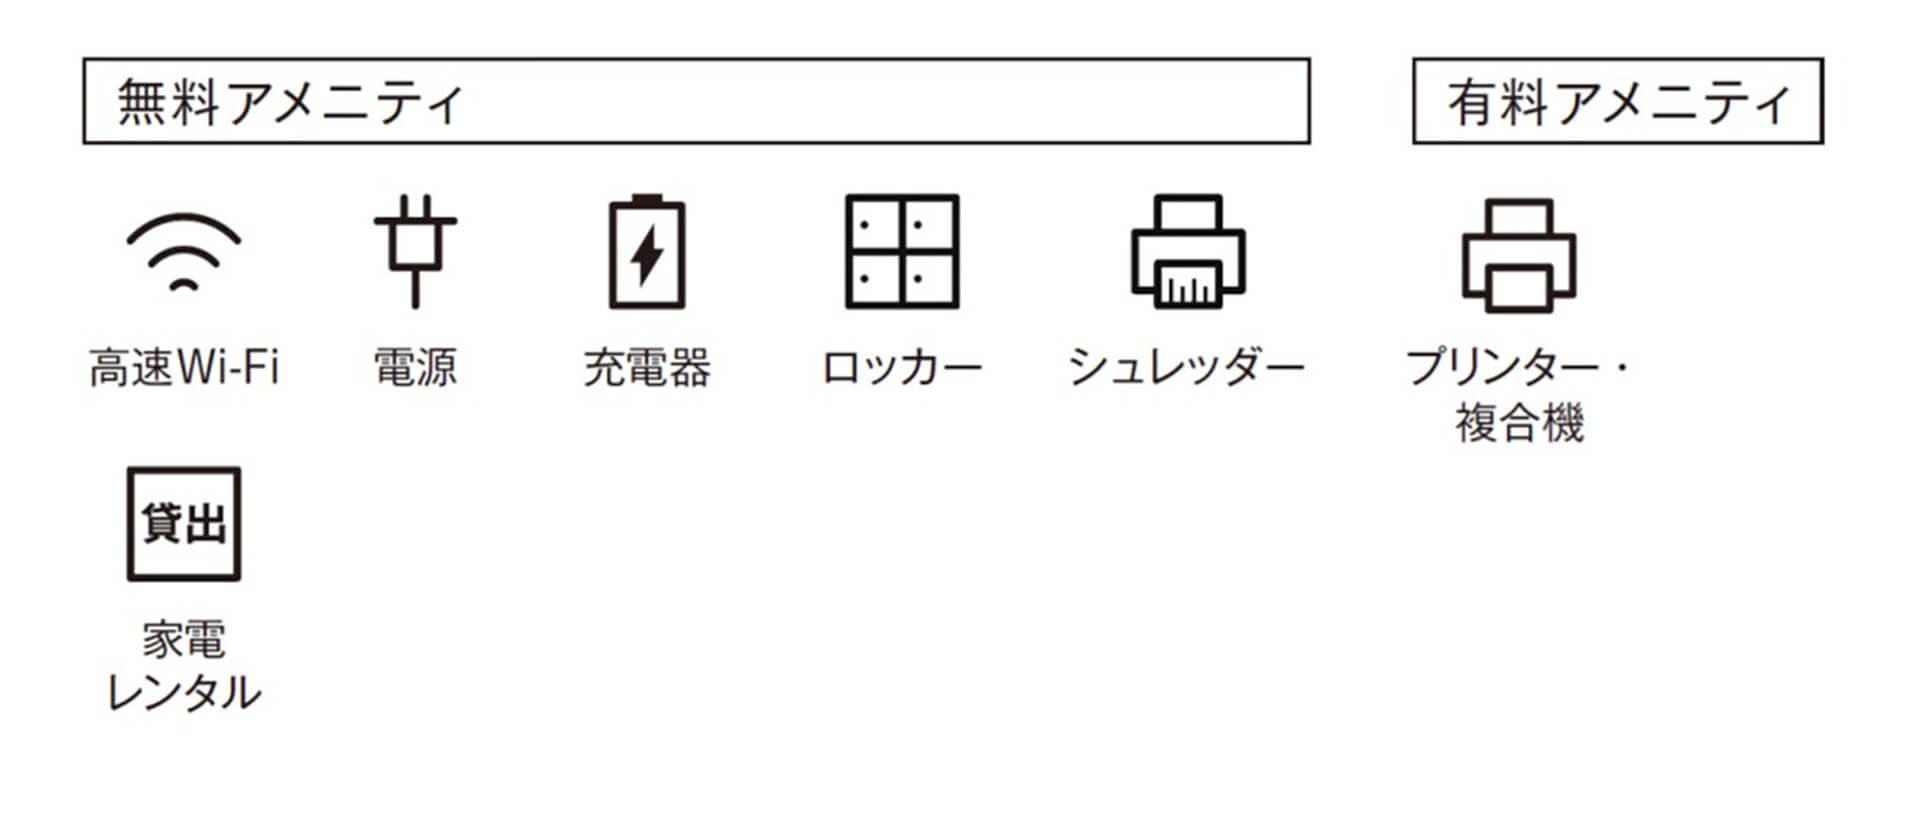 【二子玉川 蔦屋家電】SHARE LOUNGE